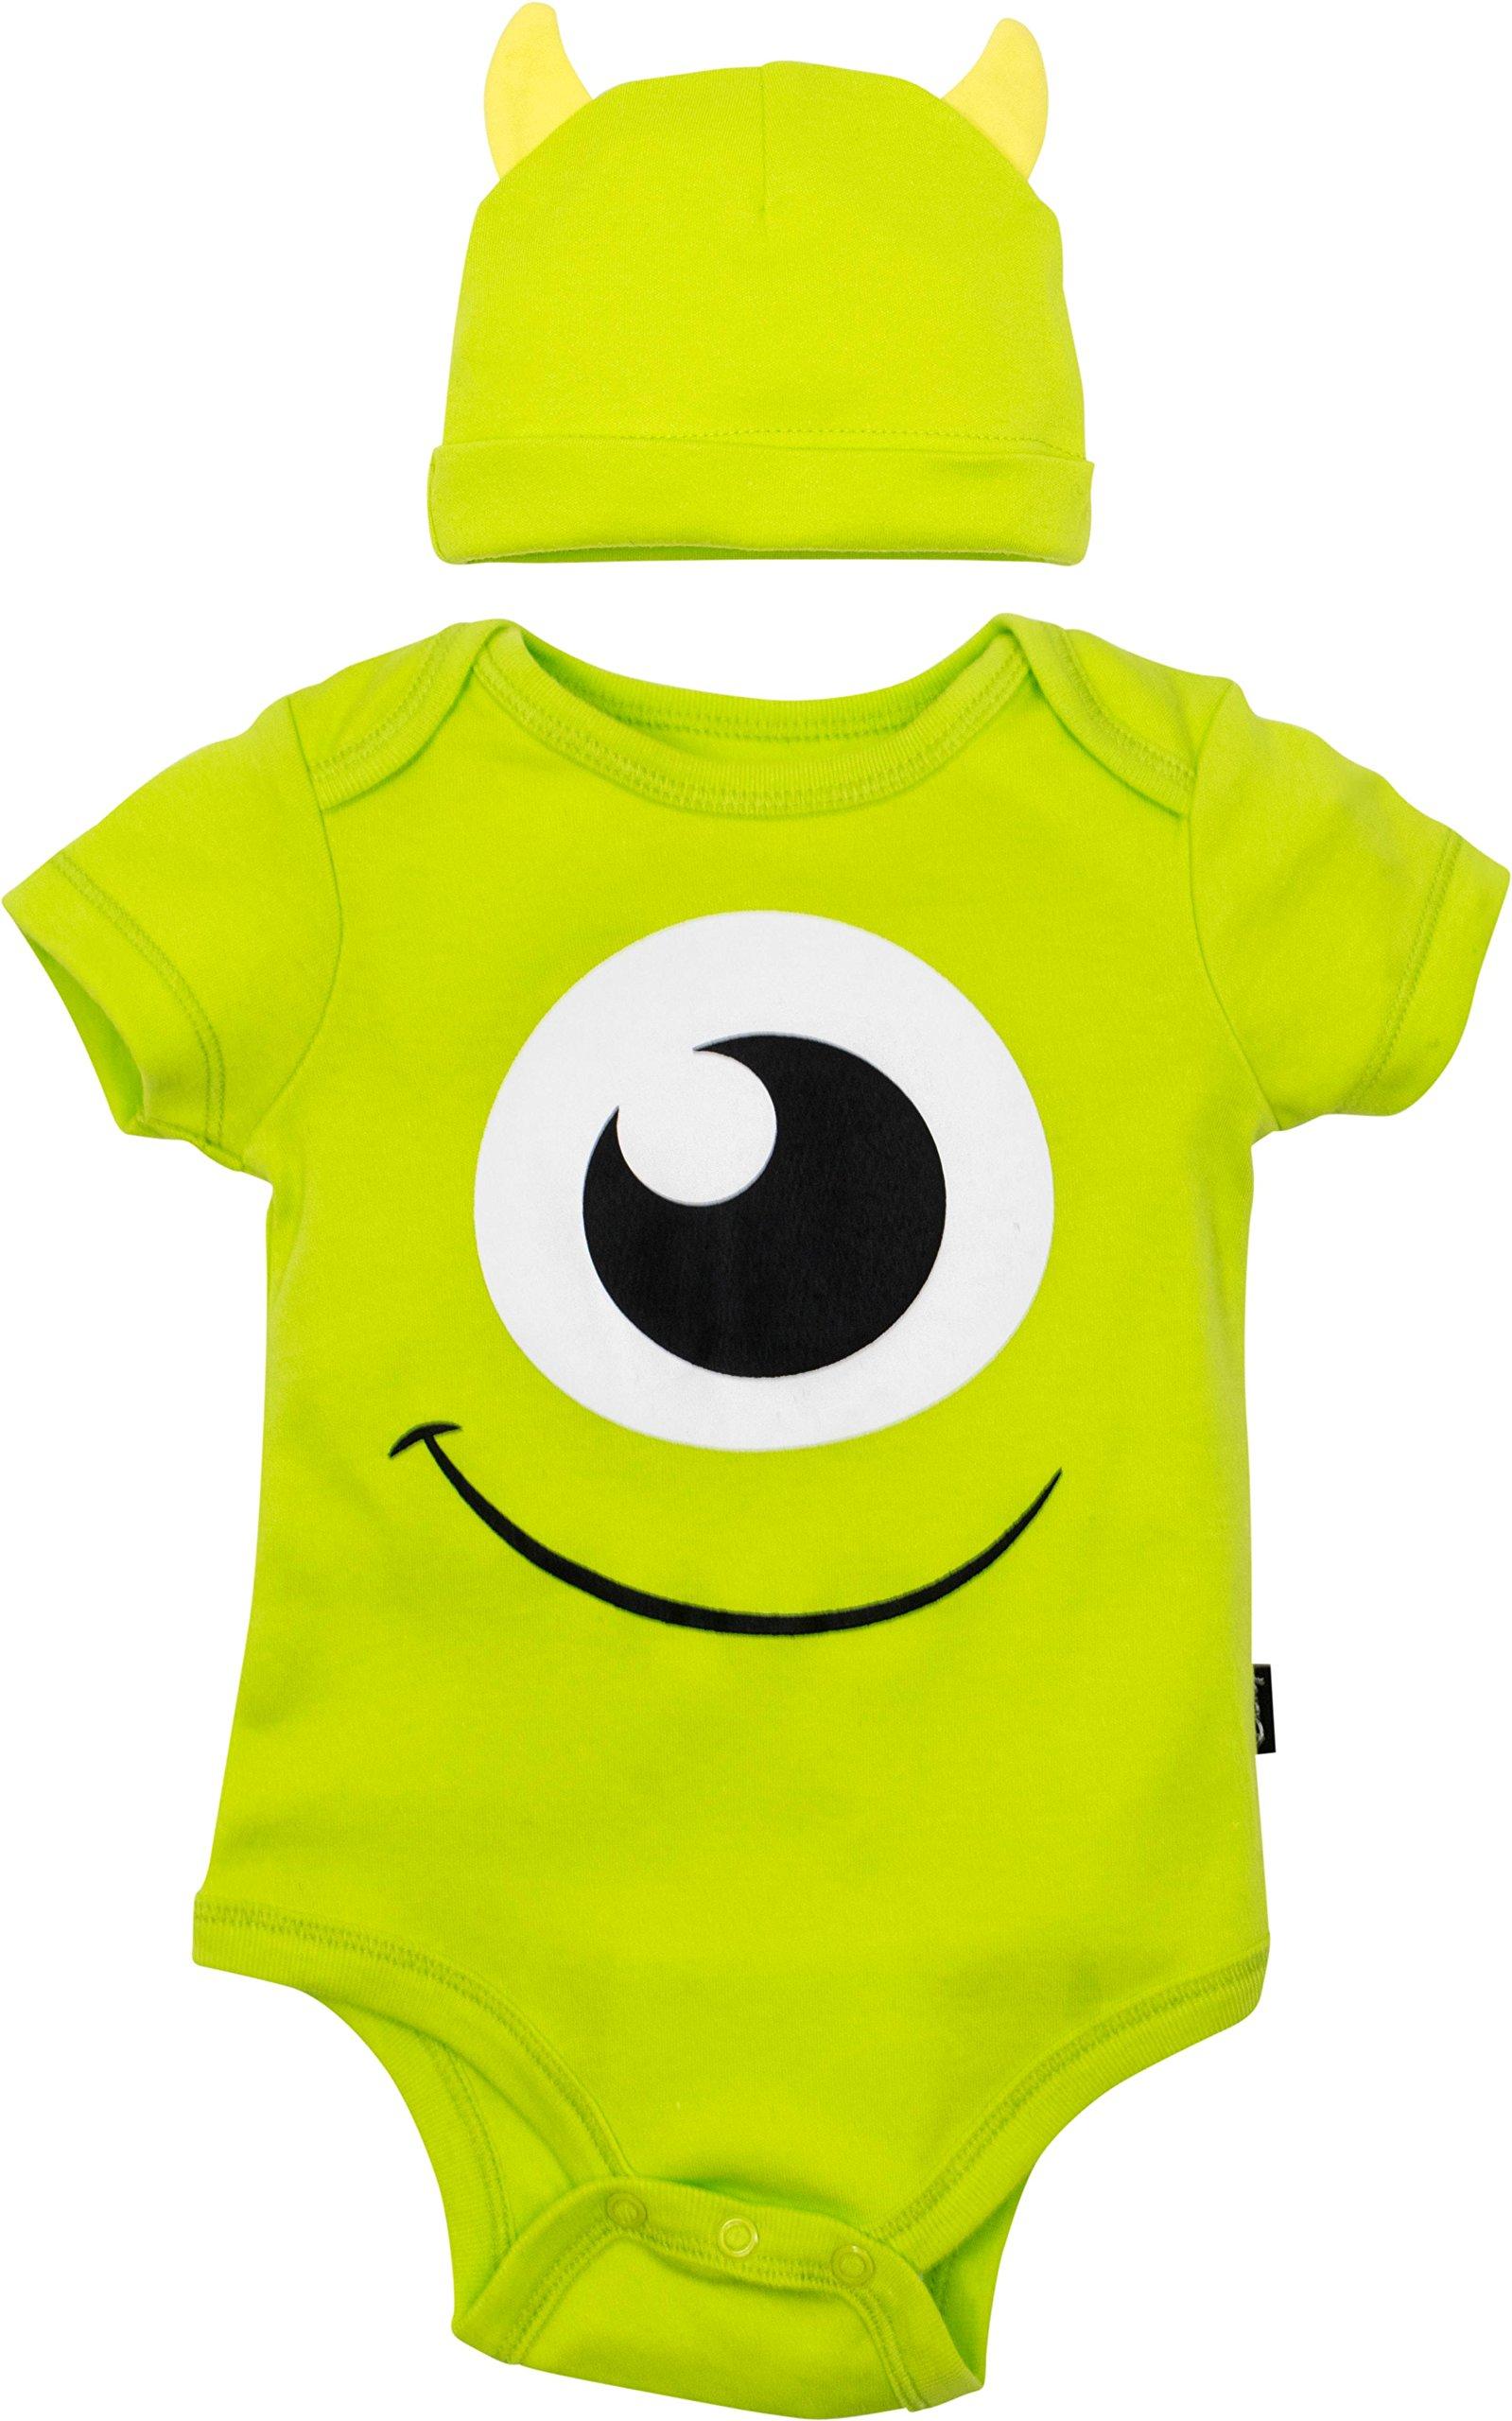 Disney Pixar Monsters Inc Mike Wazowski Baby Boys Costume Bodysuit Hat Green